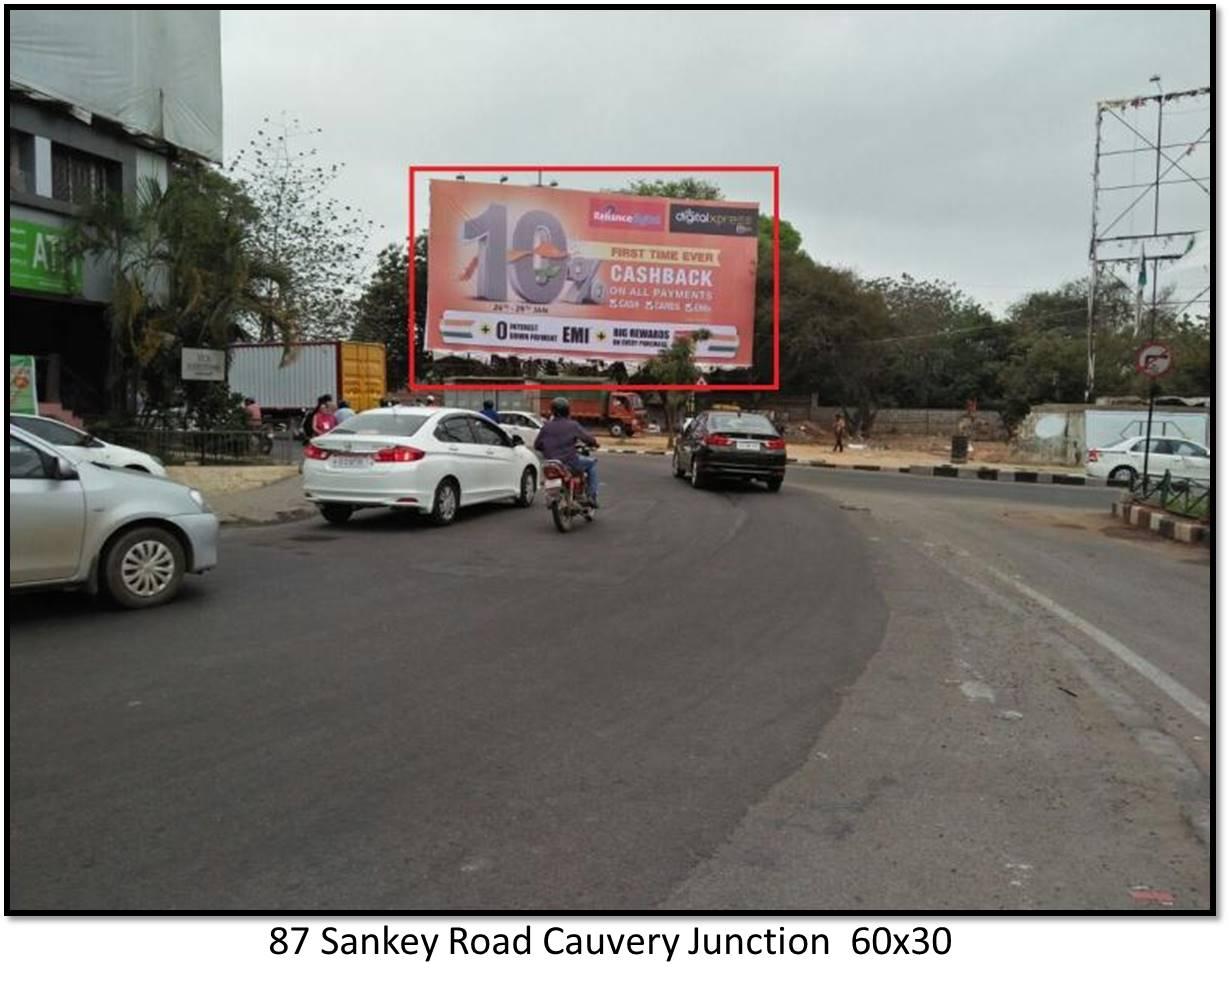 Sankey Road Cauvery Junction, Bengaluru